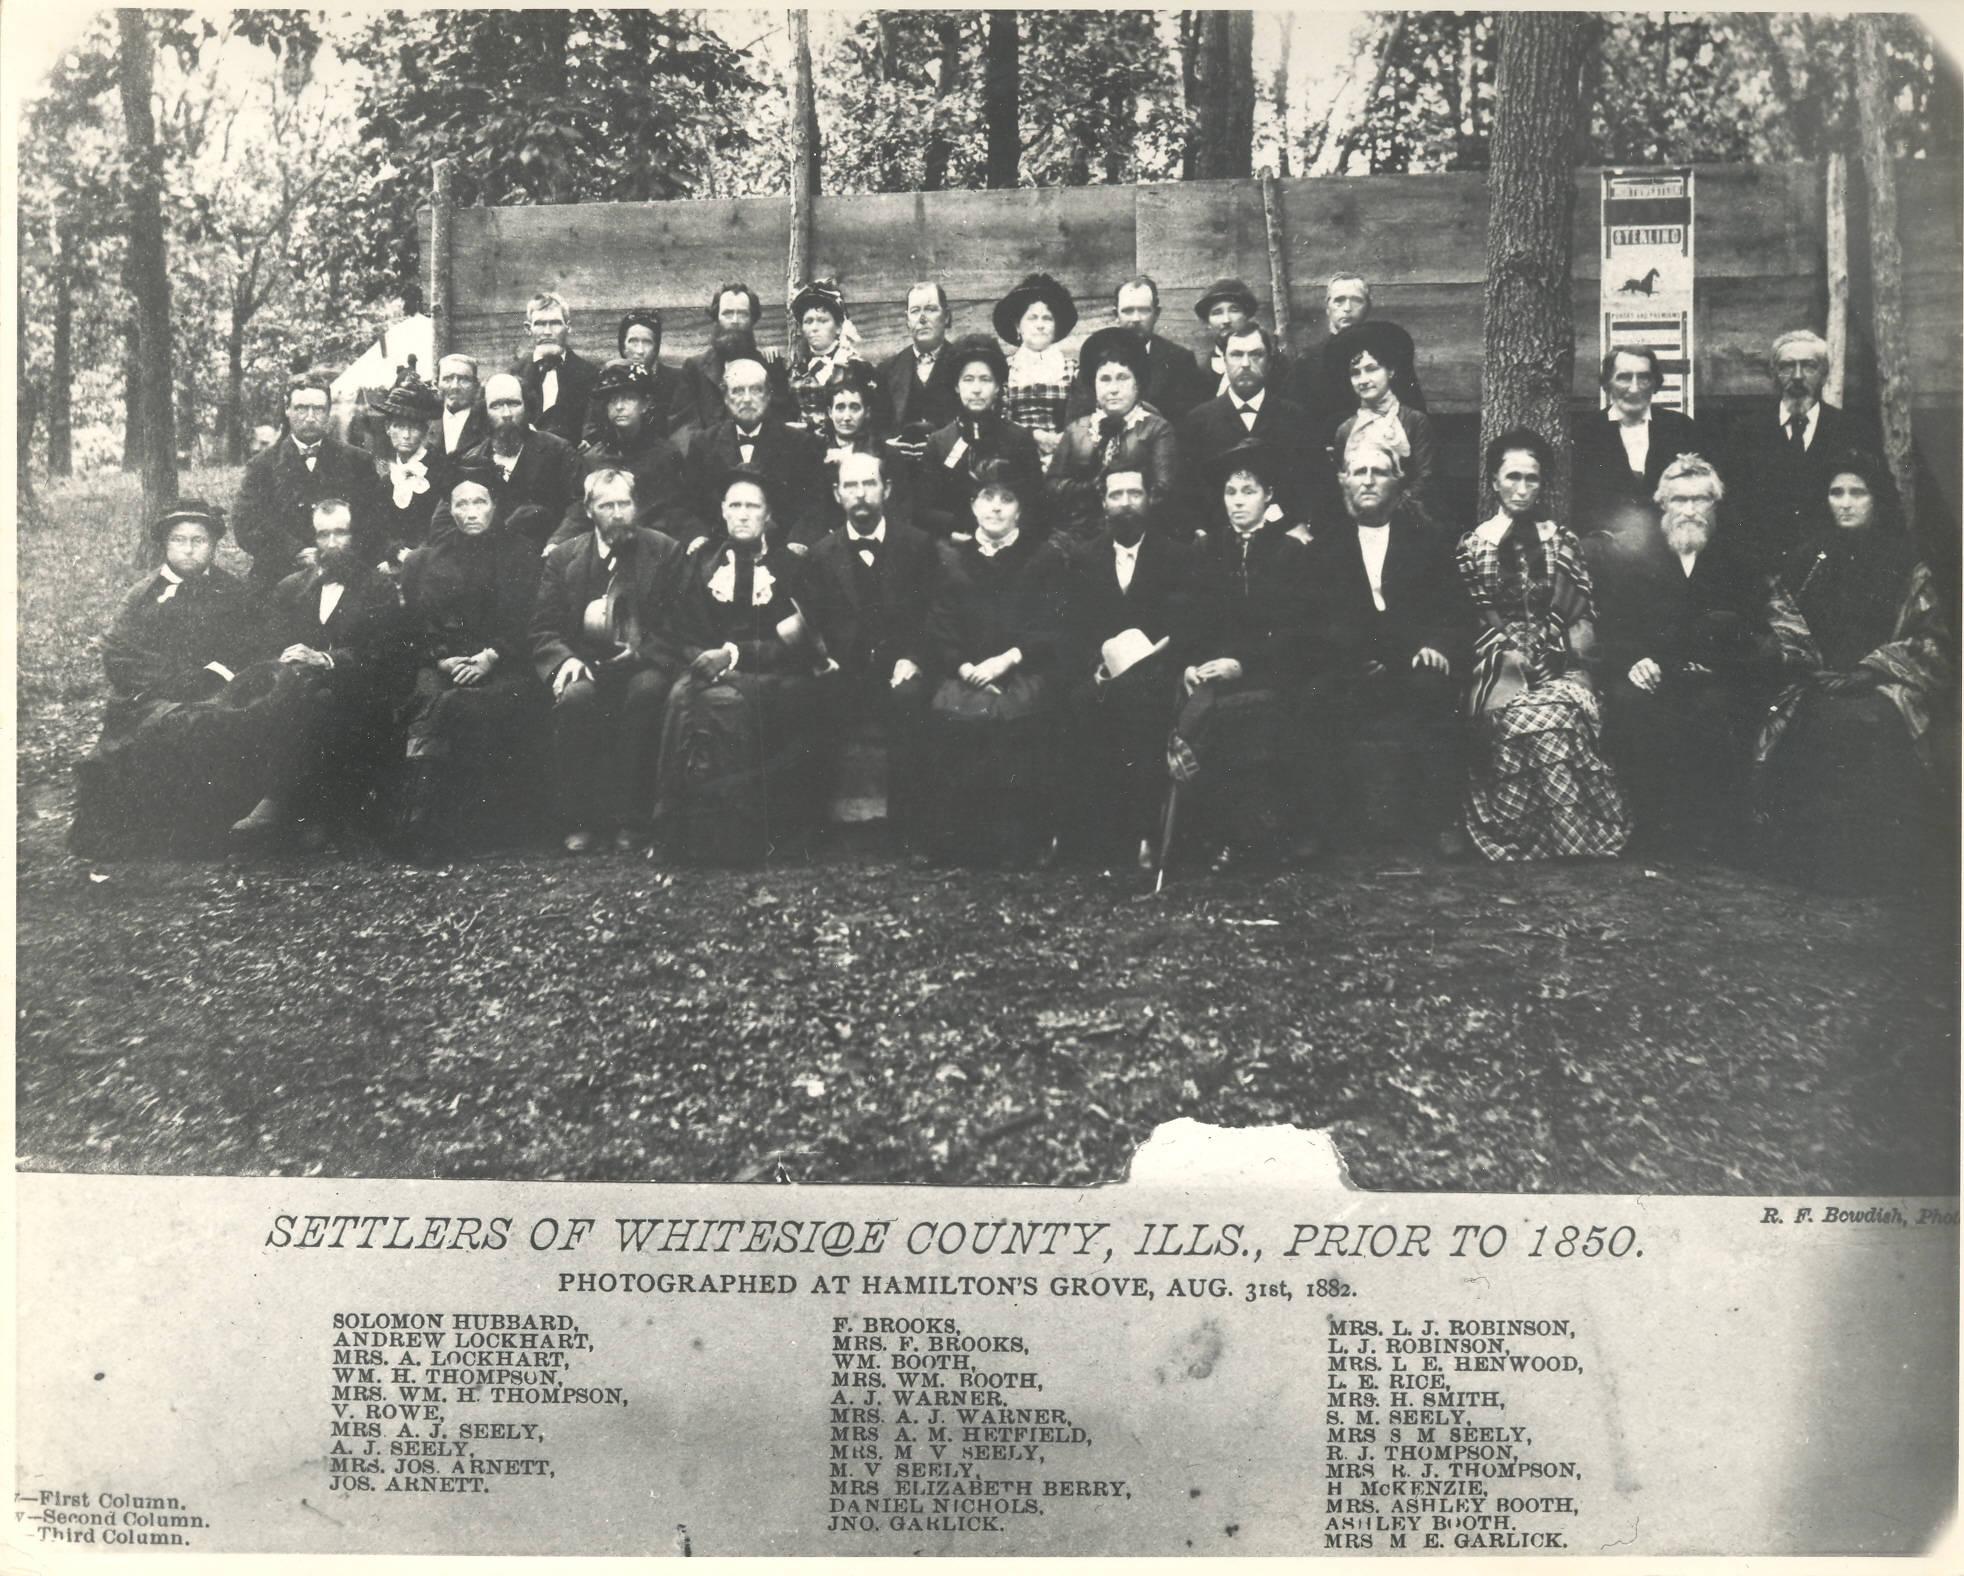 Old Settlers of Whiteside County